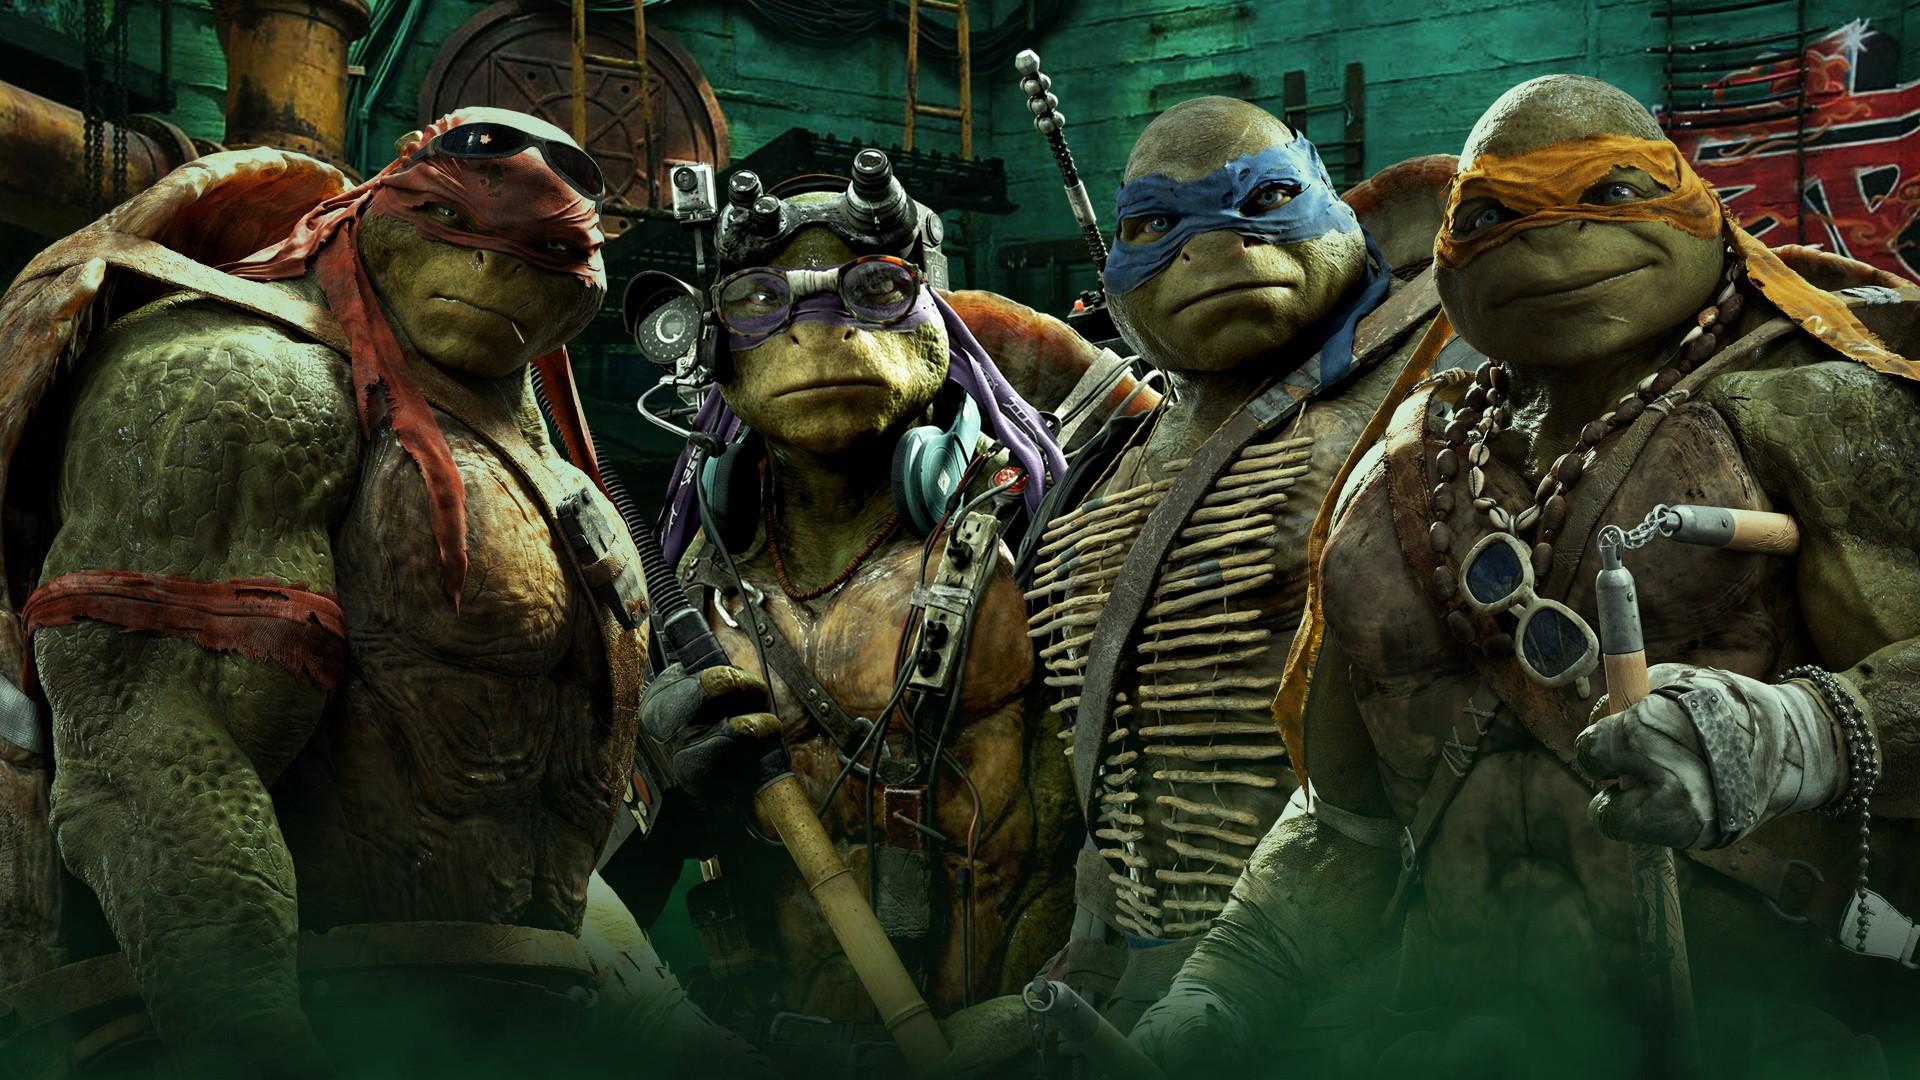 The new rebooted Teenage Mutant Ninja Turtles (2014) - (l to r) Raphael, Donatello, Leonardo and Michelangelo